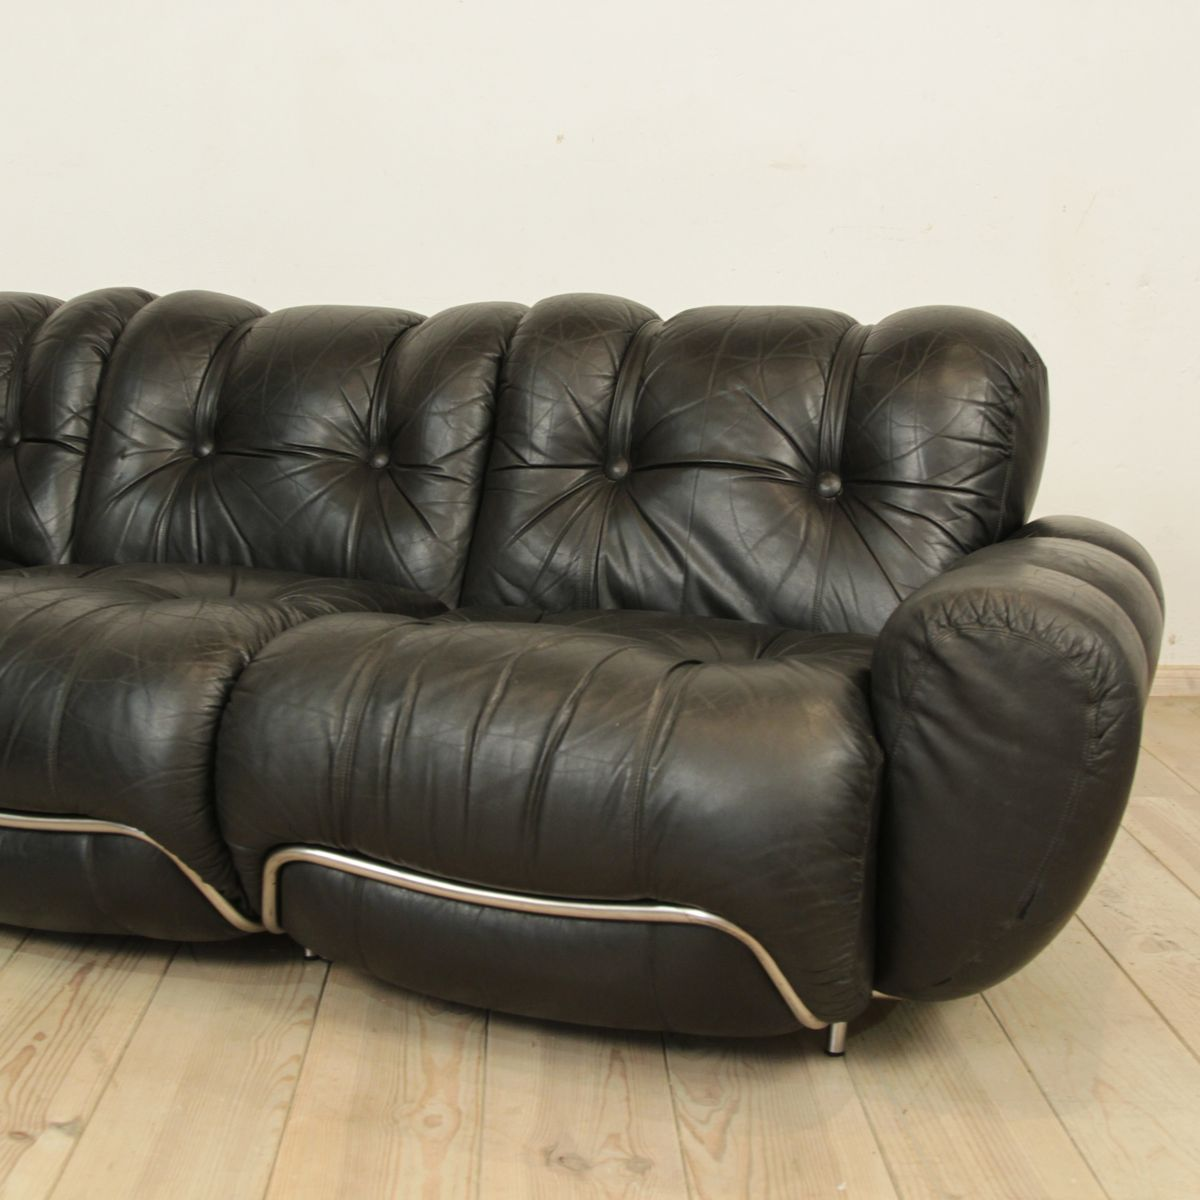 Italian Black Leather Sofa For Sale At Pamono